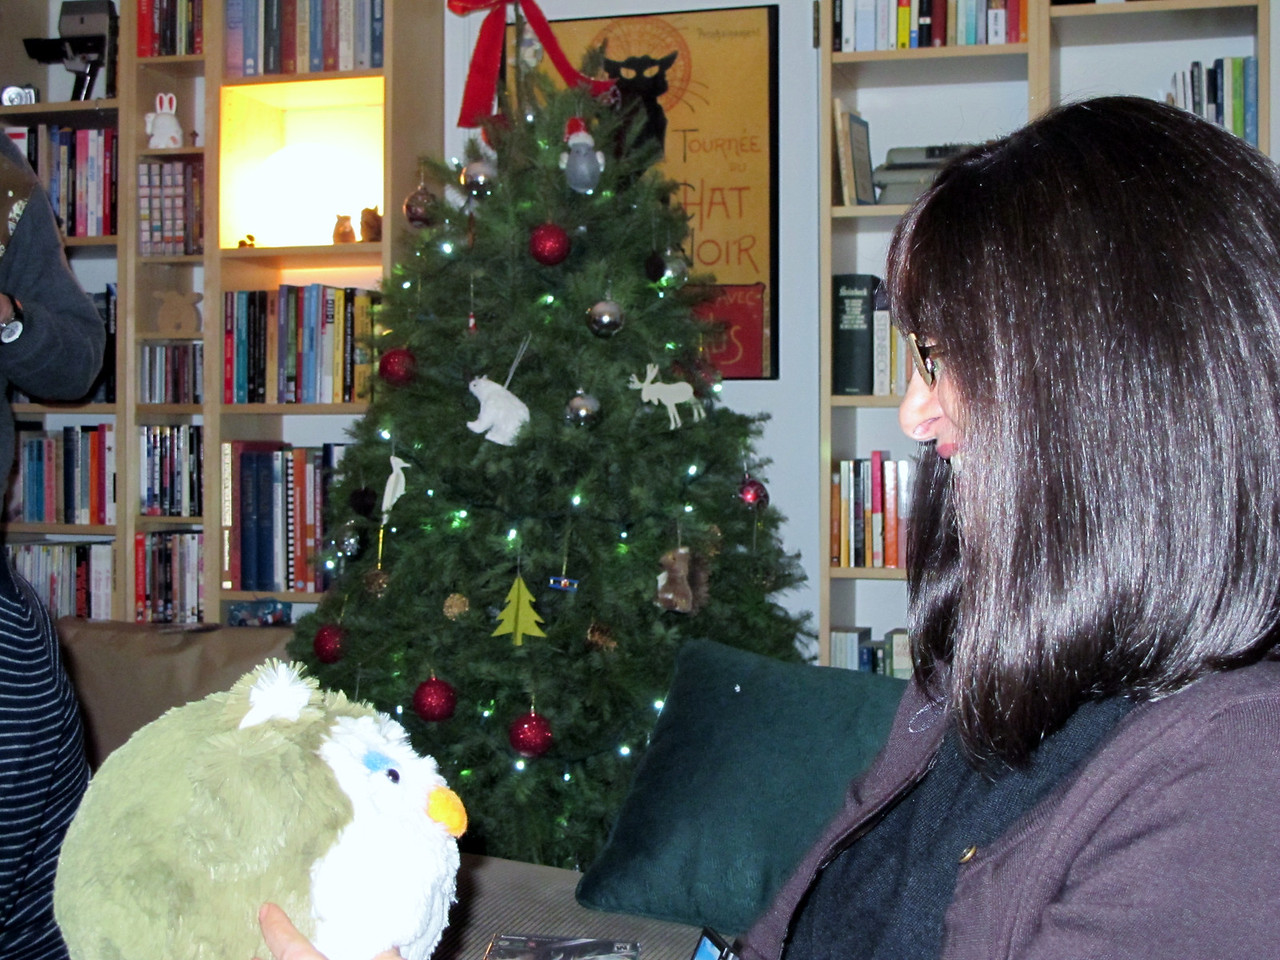 Dave's mom & her stuffed owl.